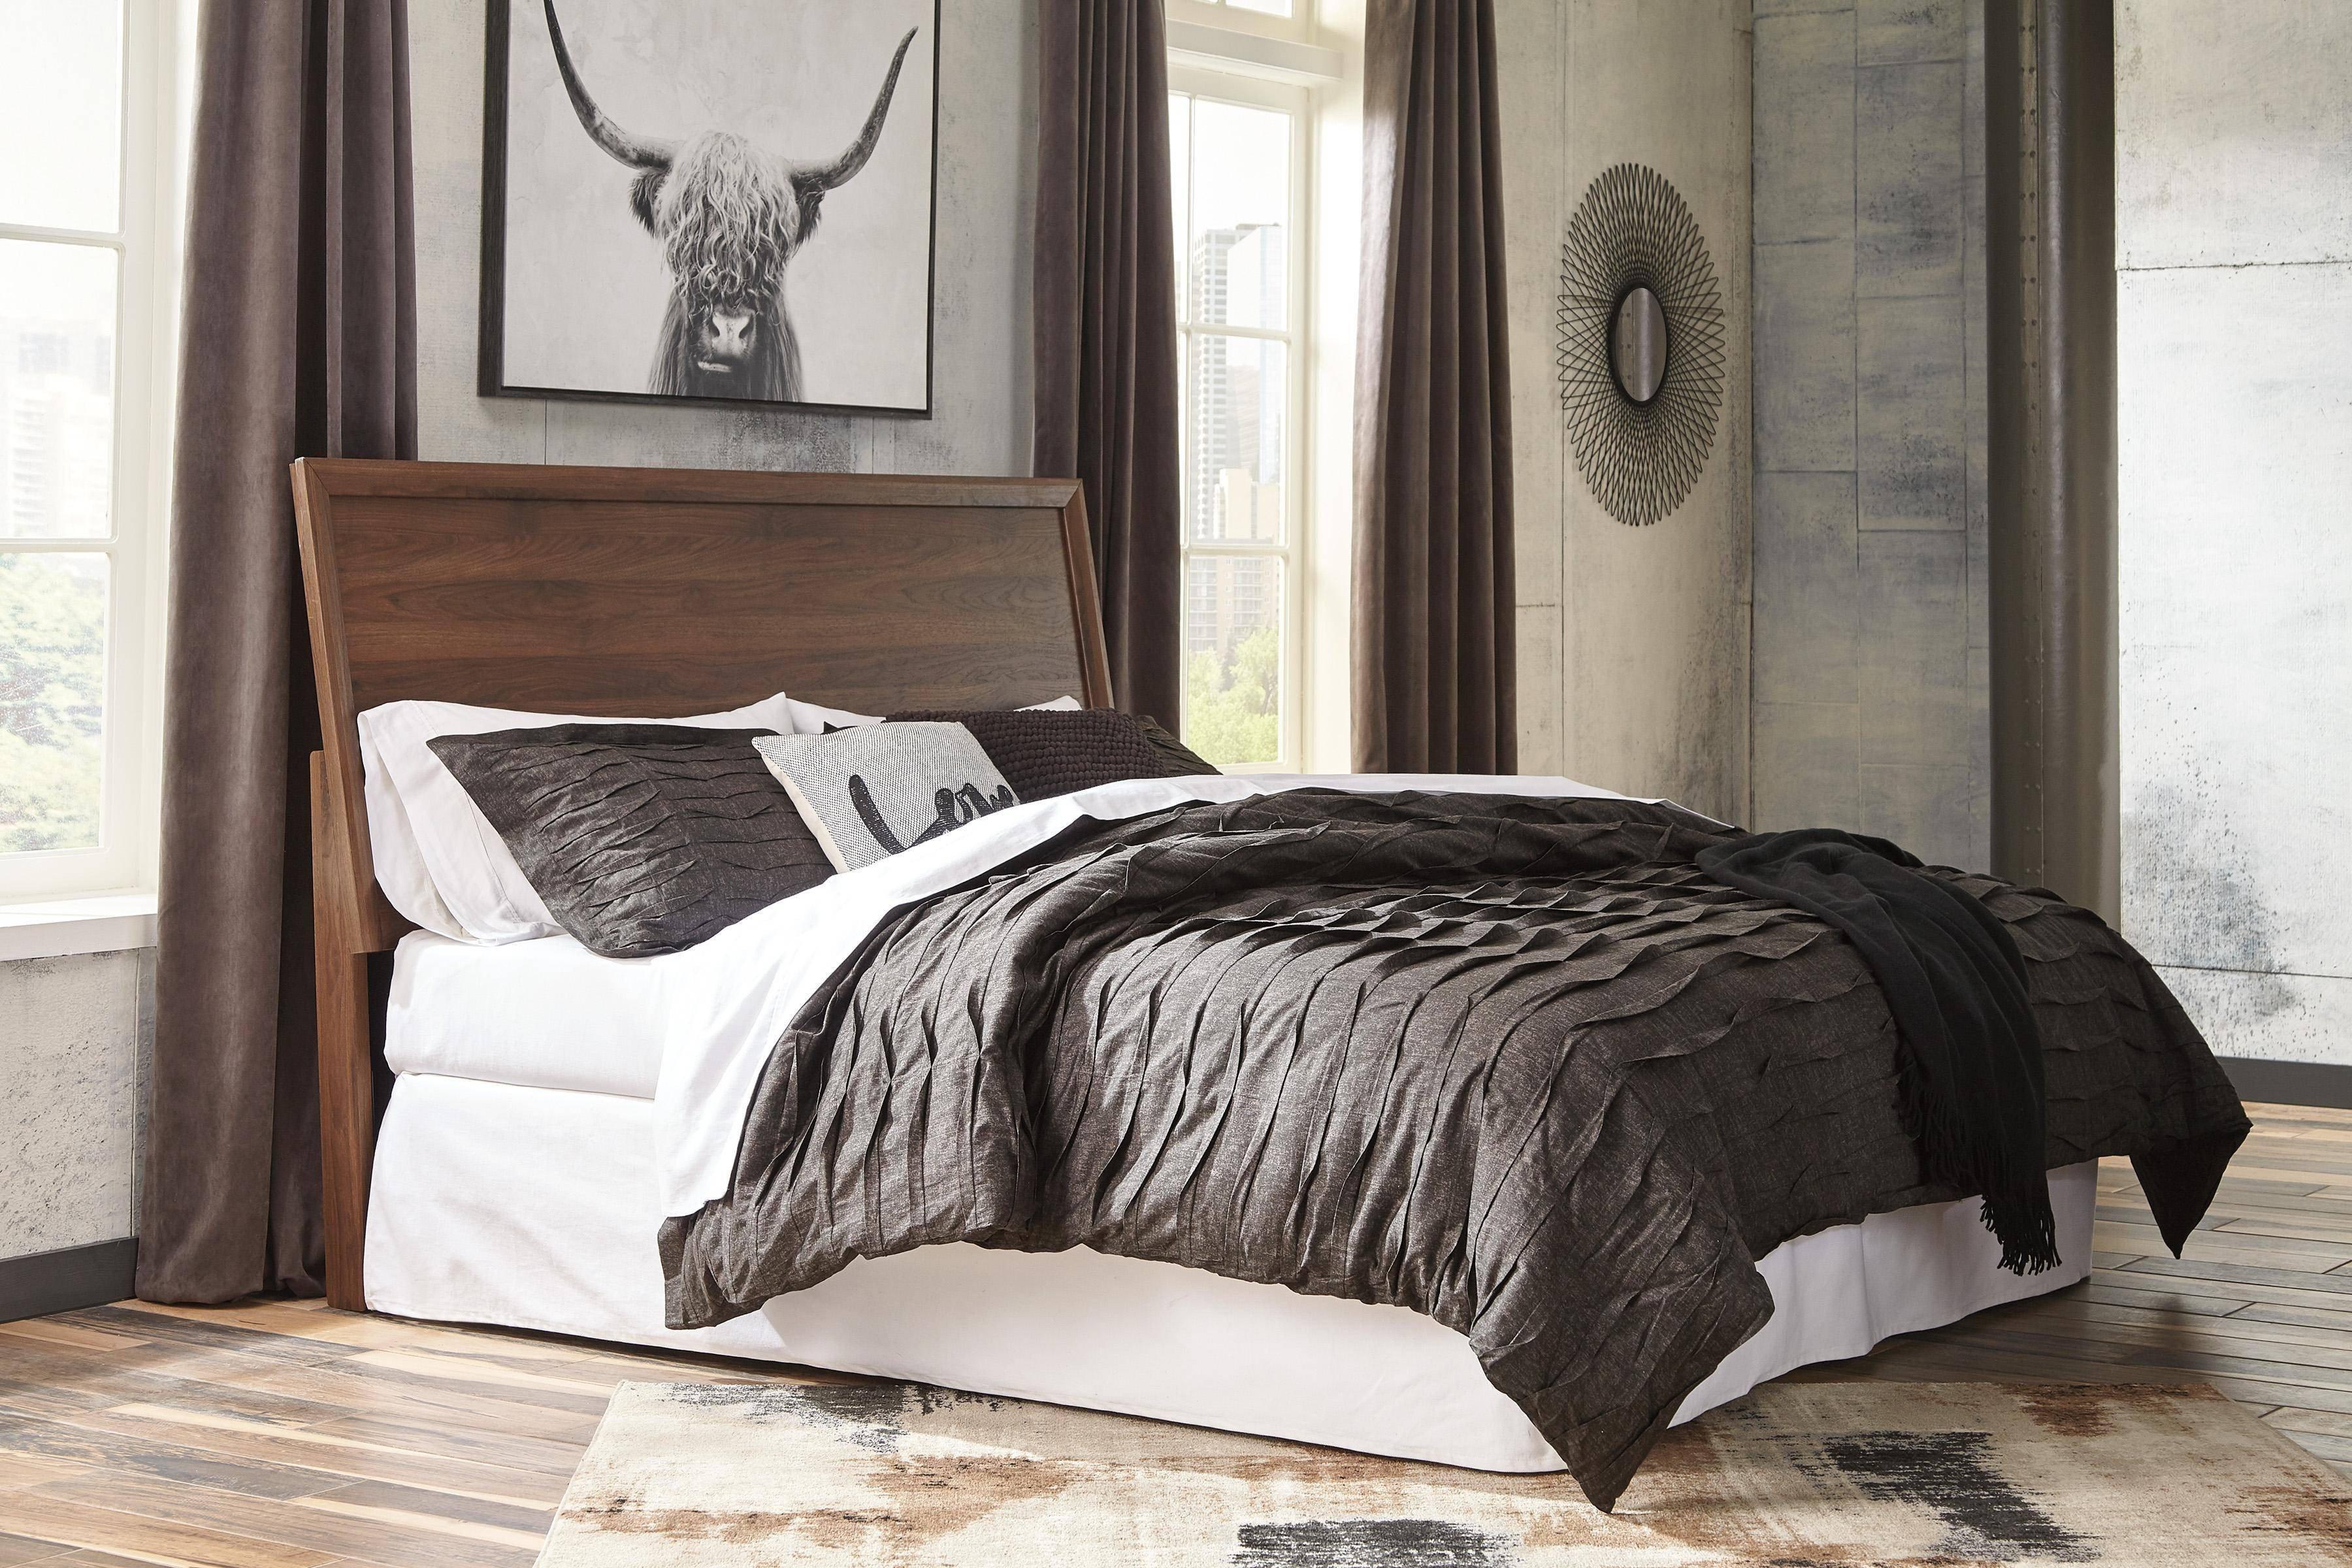 Cheap Bedroom Set Online New ashley Daneston B292 King Size Panel Bedroom Set 6pcs In